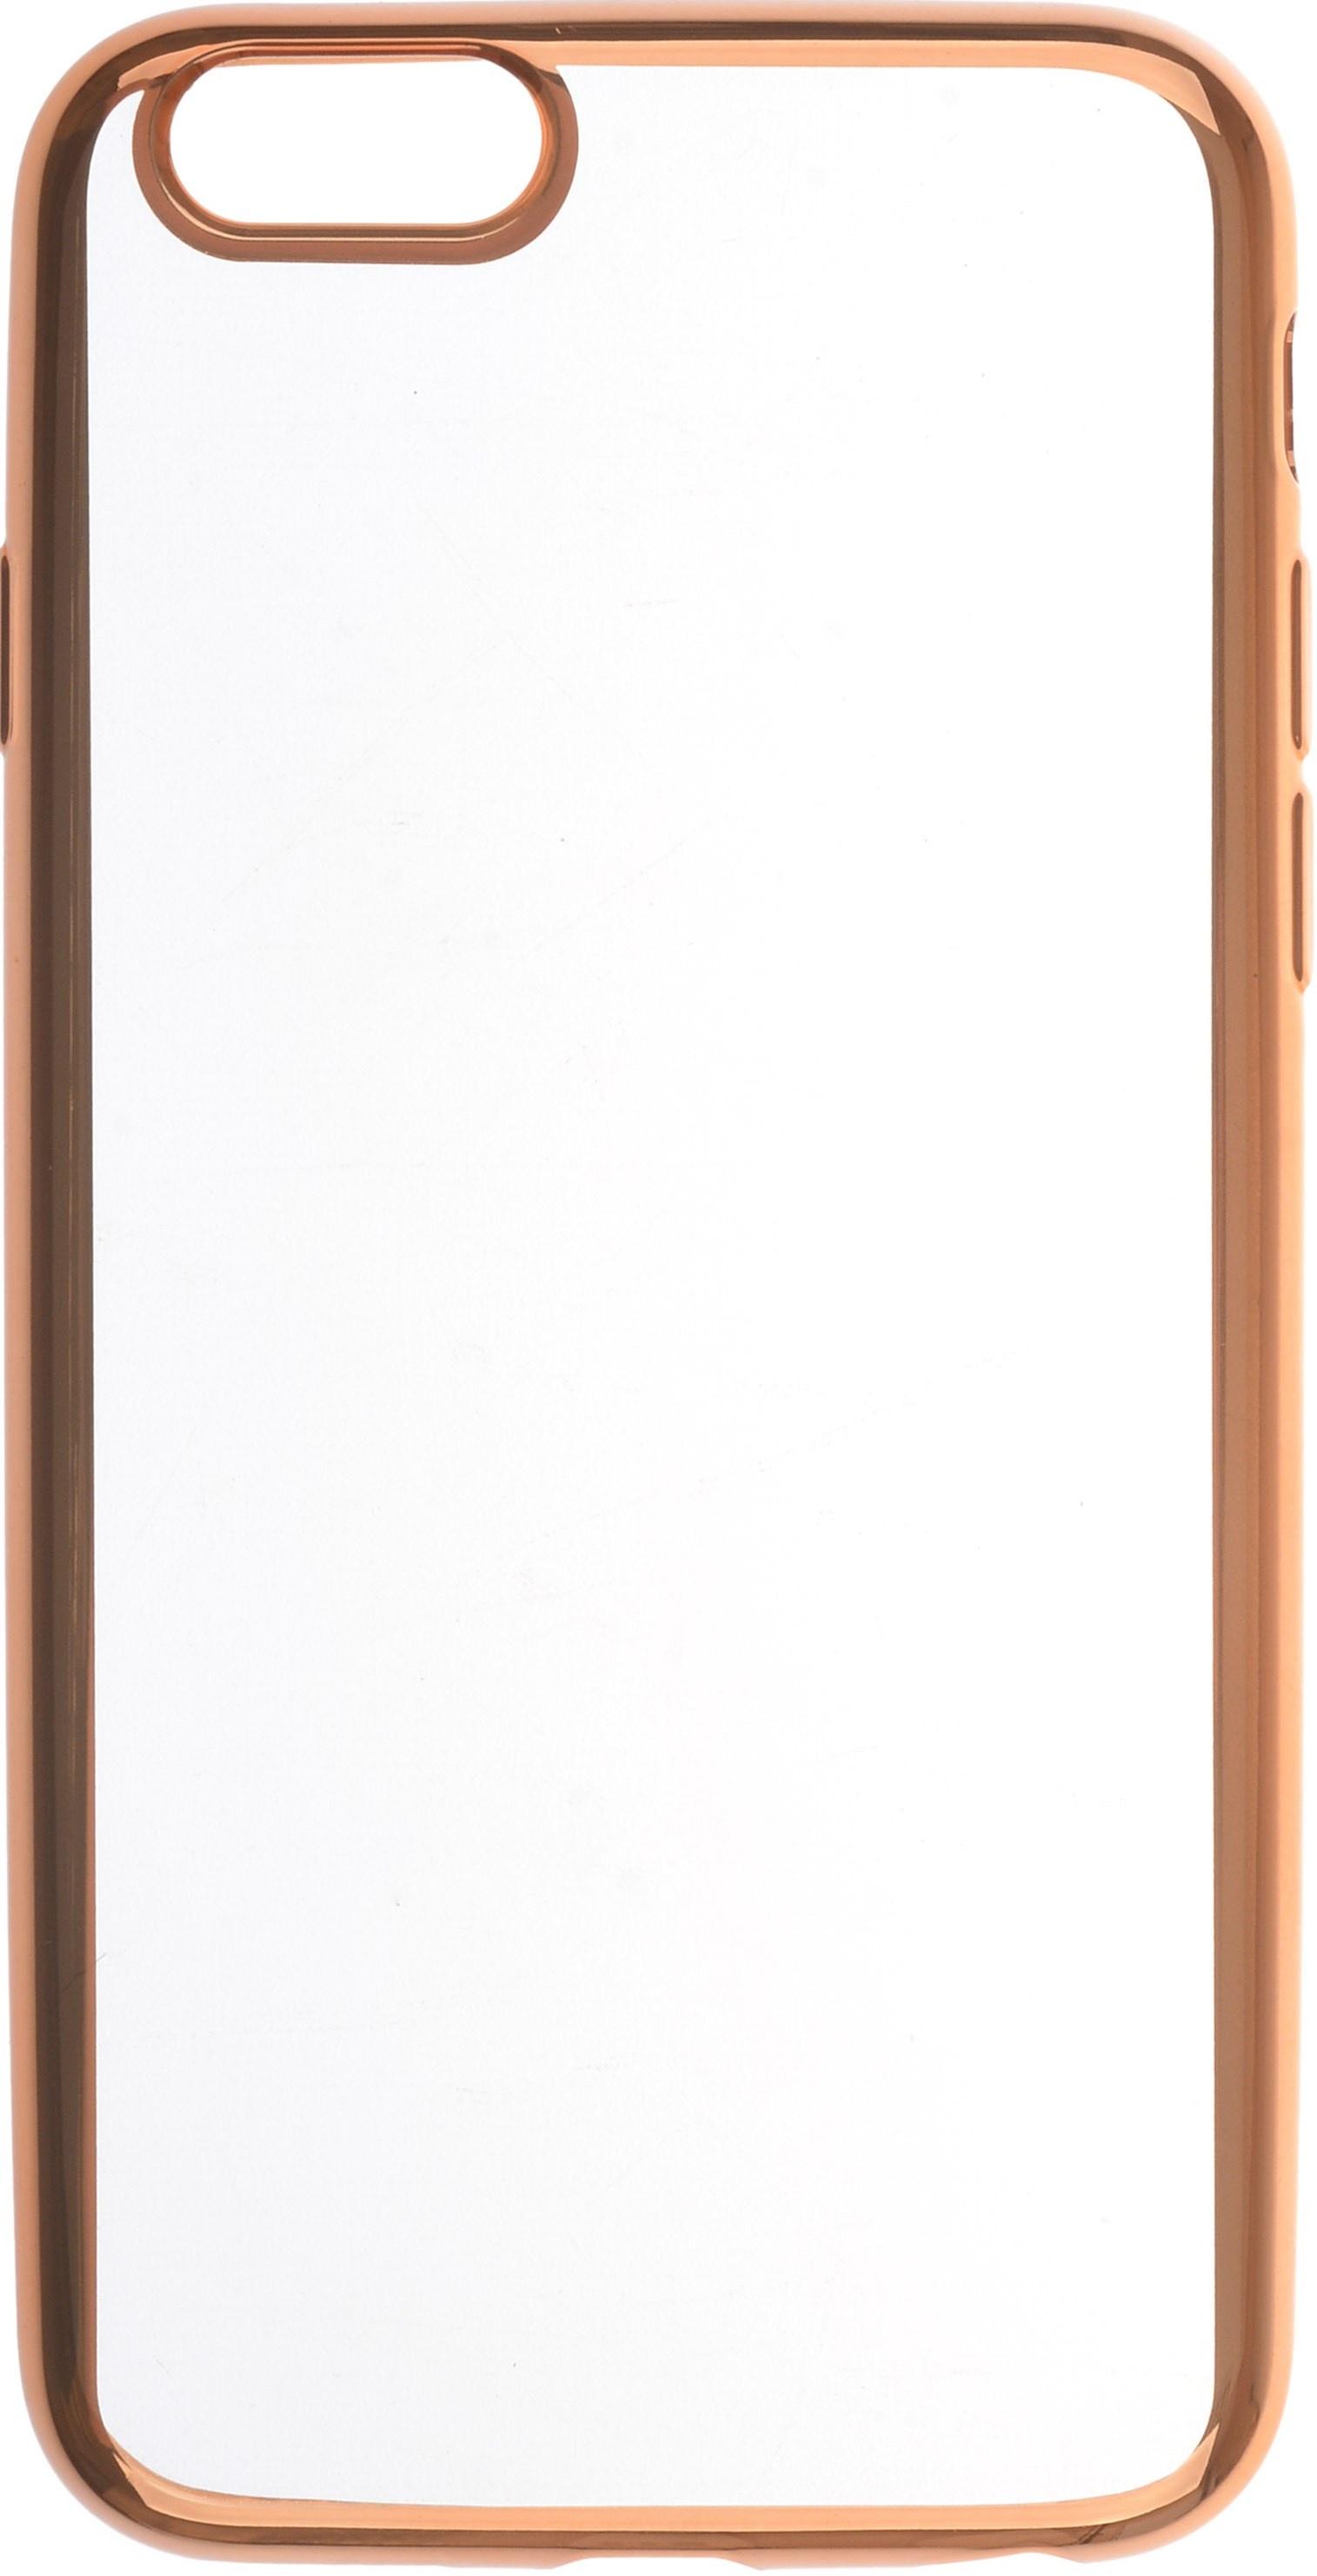 Чехол для сотового телефона skinBOX Silicone chrome border, 4630042524941, золотой skinbox 4people slim silicone чехол накладка для xiaomi redmi 4a transparent